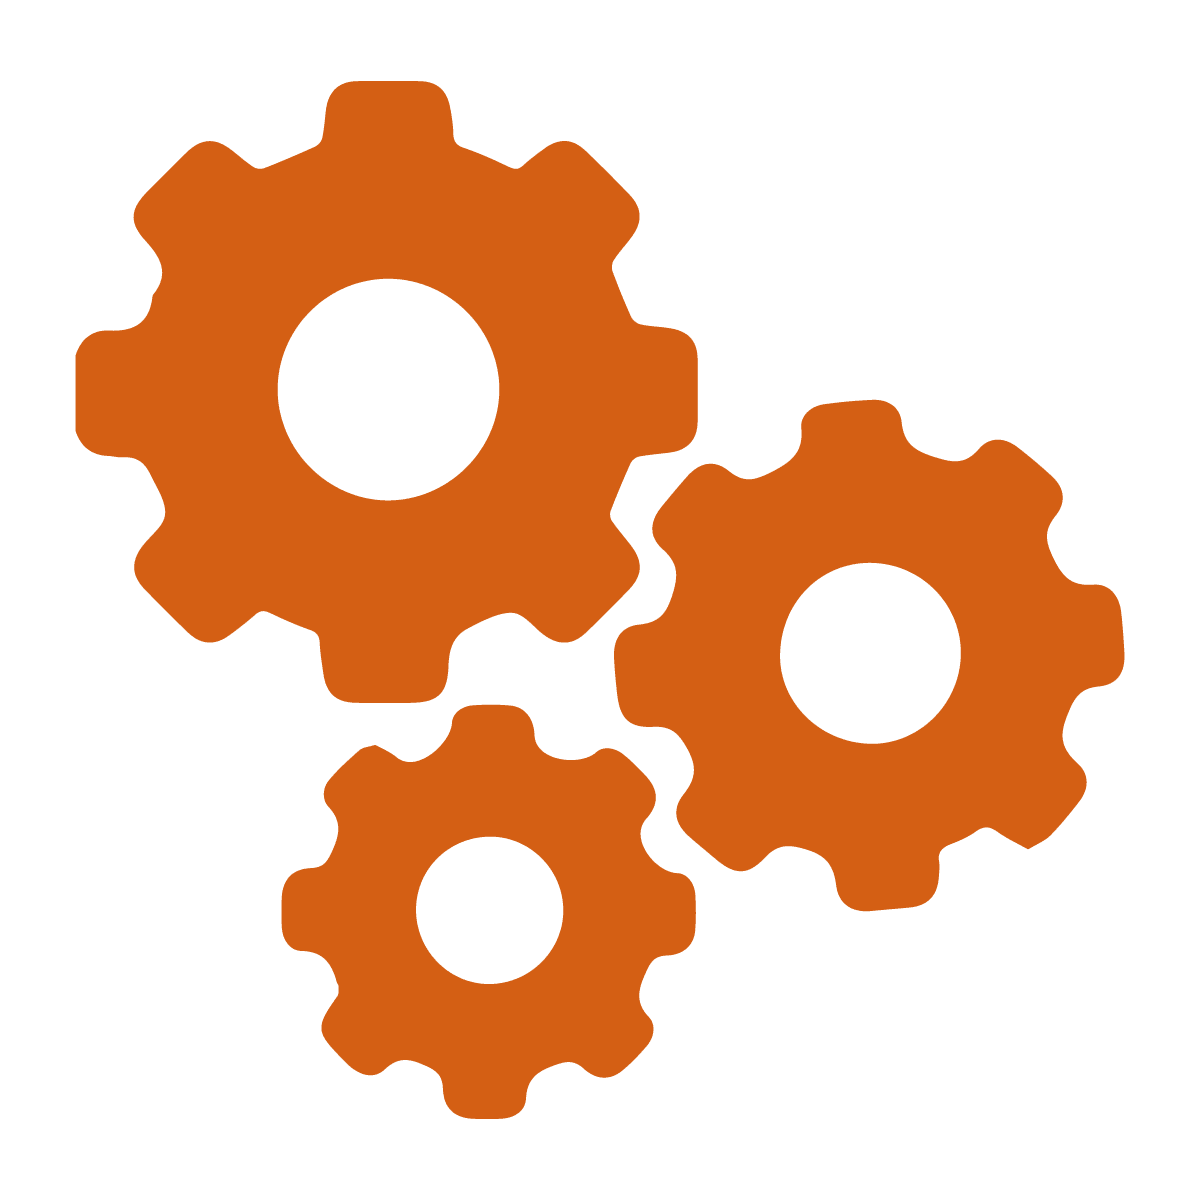 arvense-group-5f-methodology-step-4-fix-orange